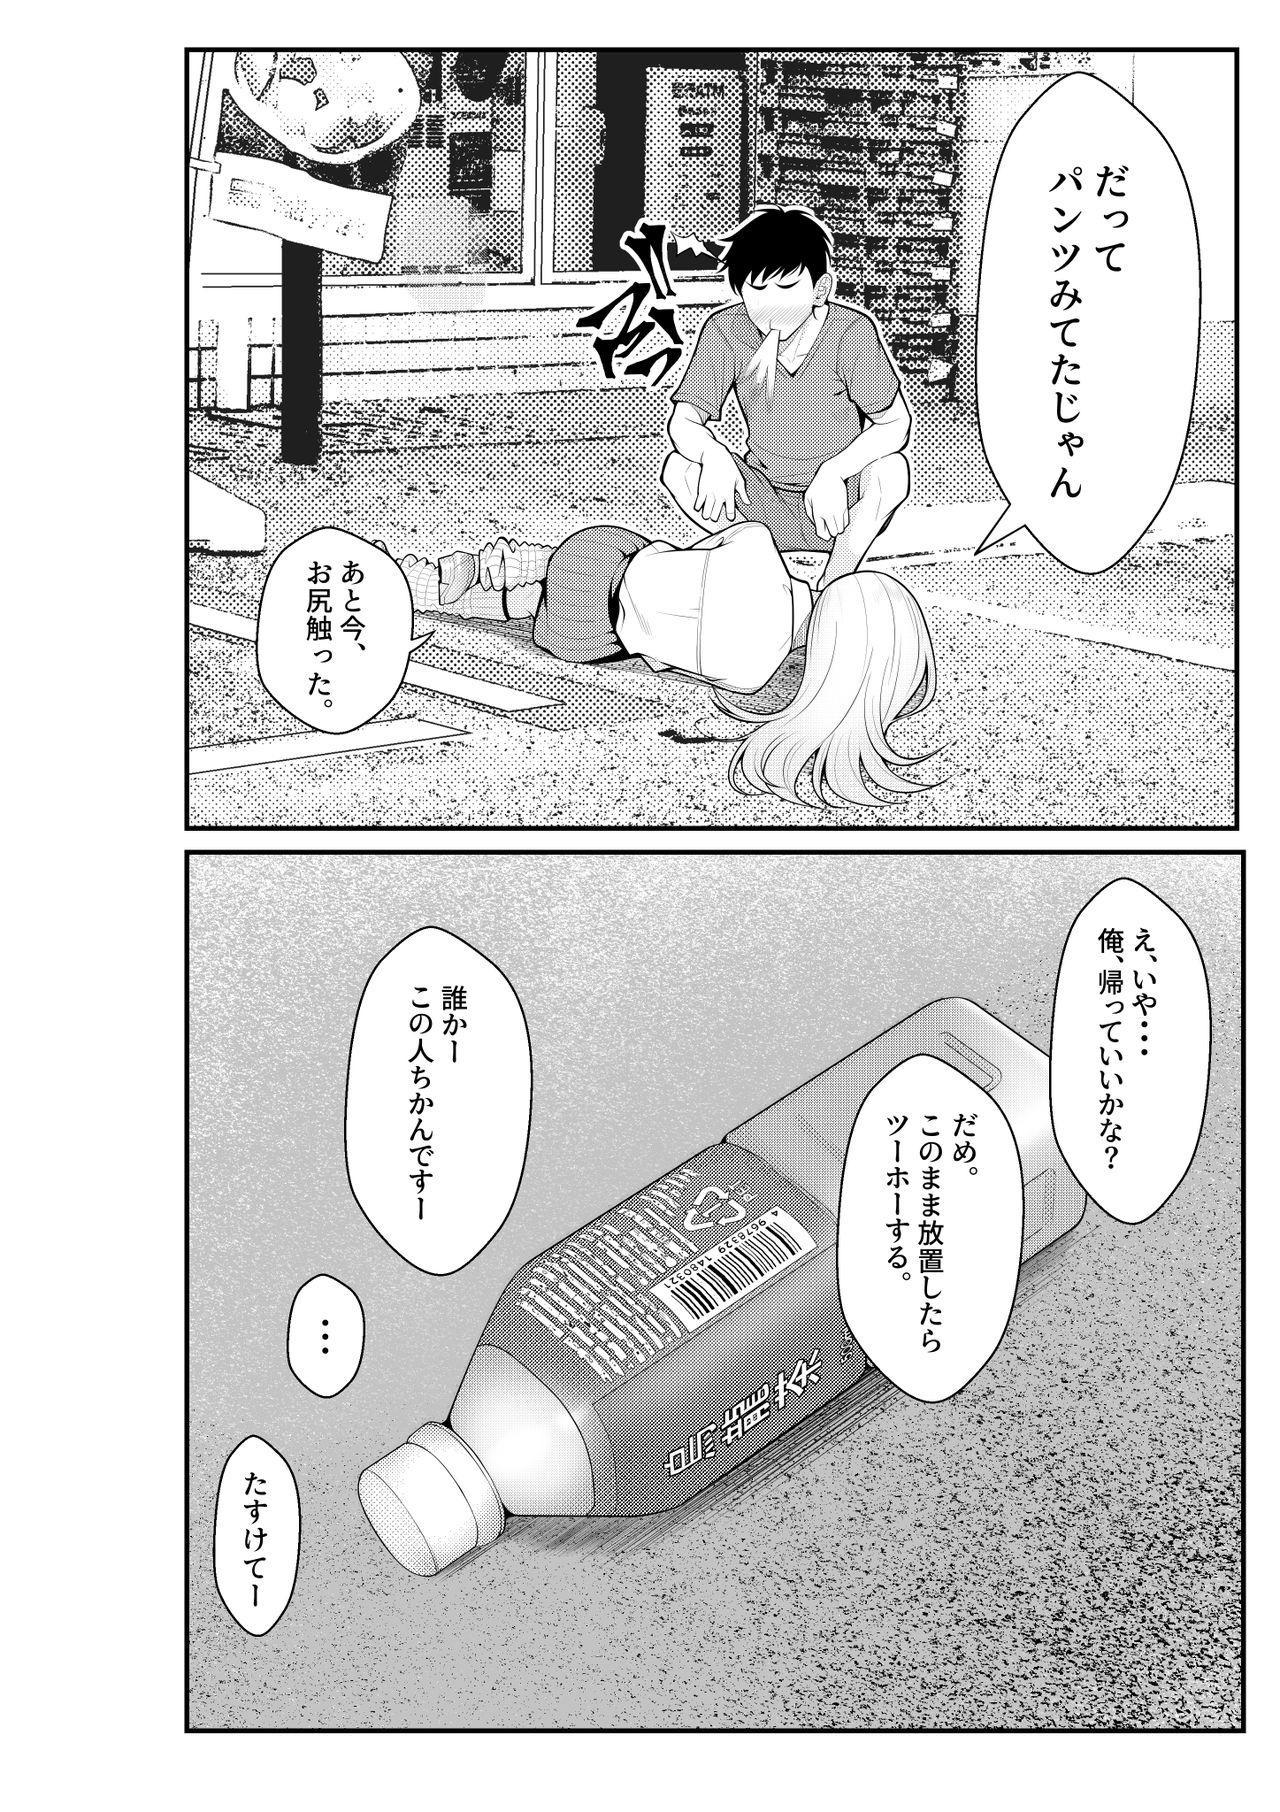 Iede Gal o Hirottara Harem ni Natta Hanashi 7